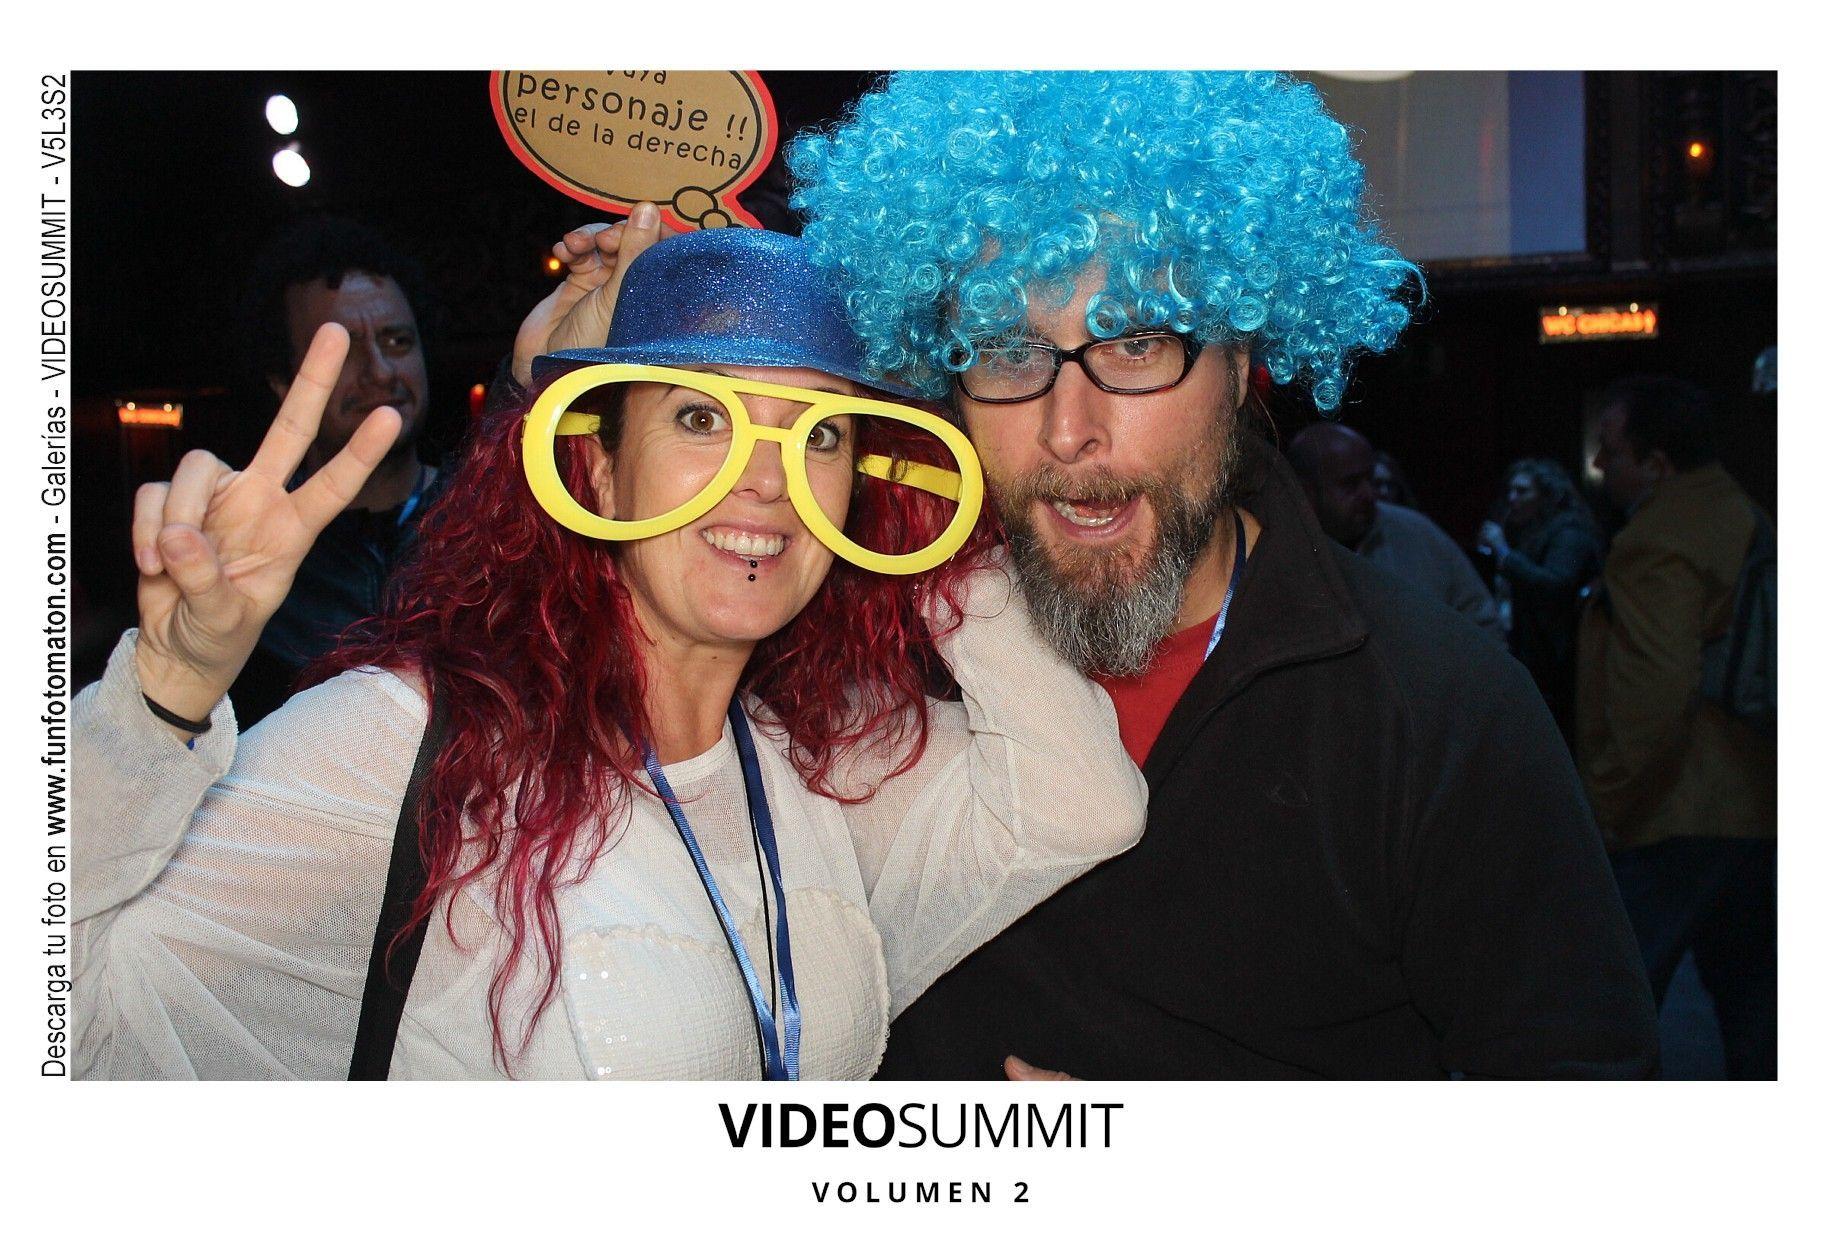 videosummit-vol2-club-party-055